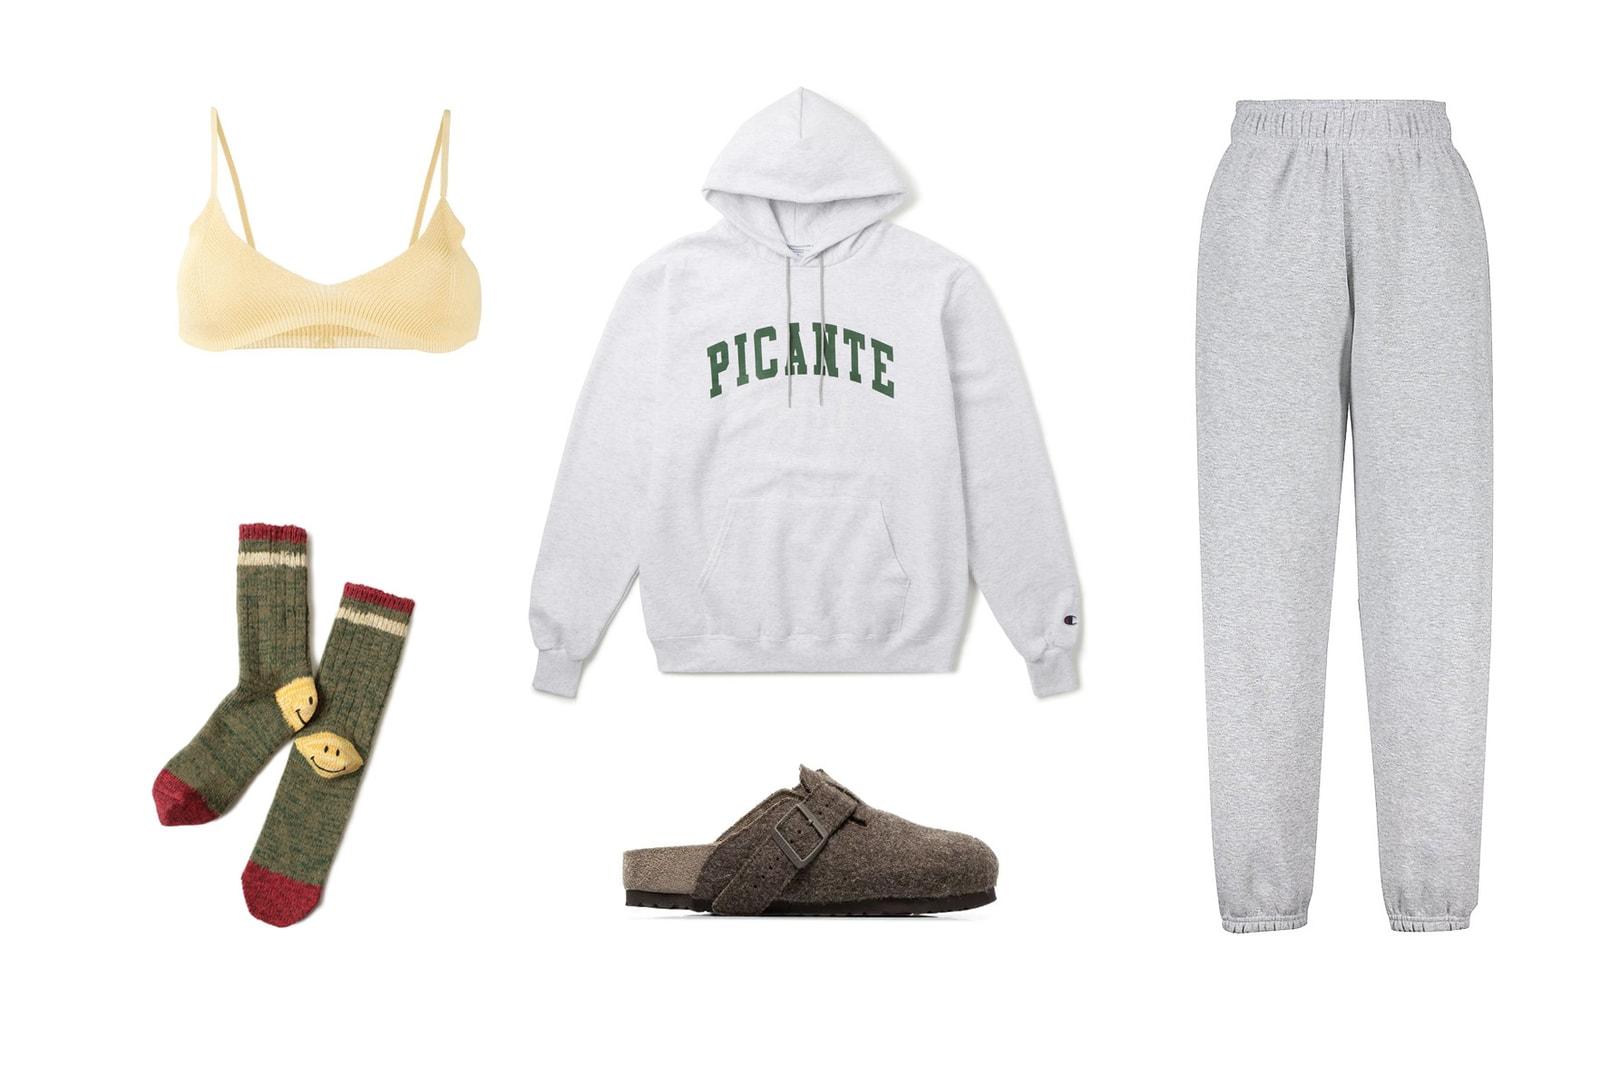 Brandy Melville Rosa Sweatpants Soho House Memes Picante Logo Hoodie Kapital Knit Socks Rick Owens x Birkenstock Sandals Jacquemus Knit Bralette